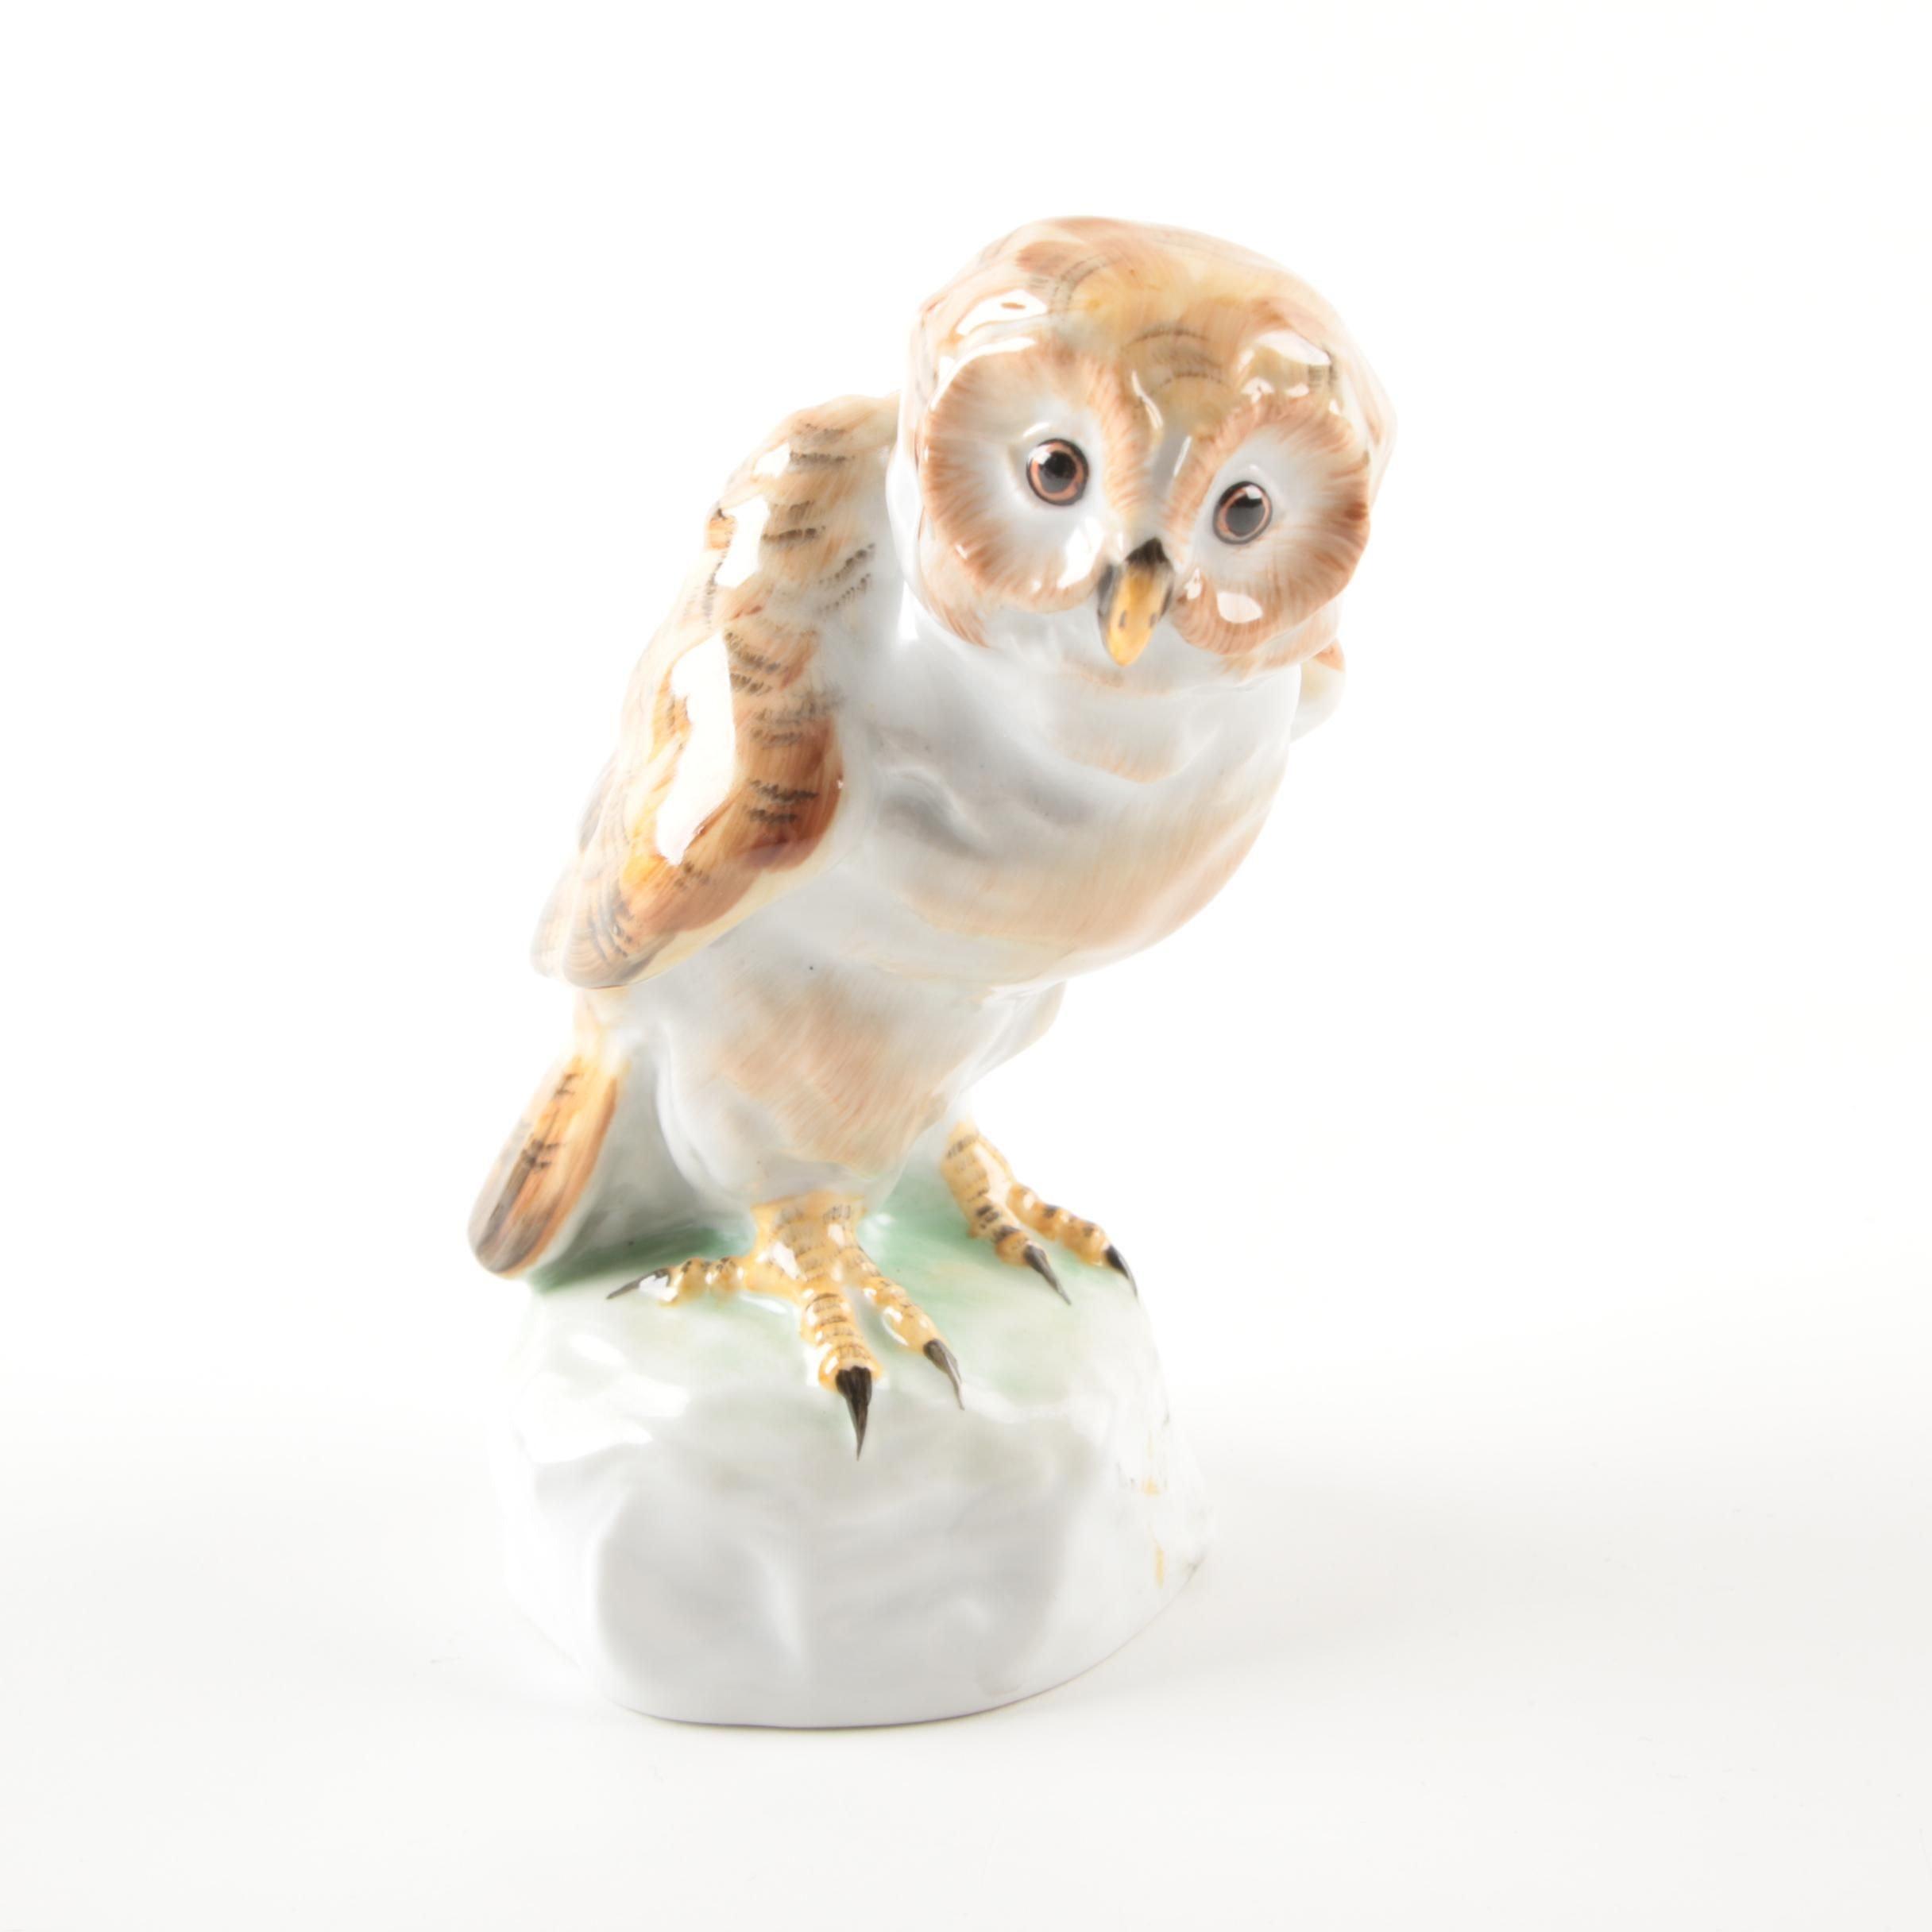 Vintage Herend Hungary Porcelain Barn Owl Figurine